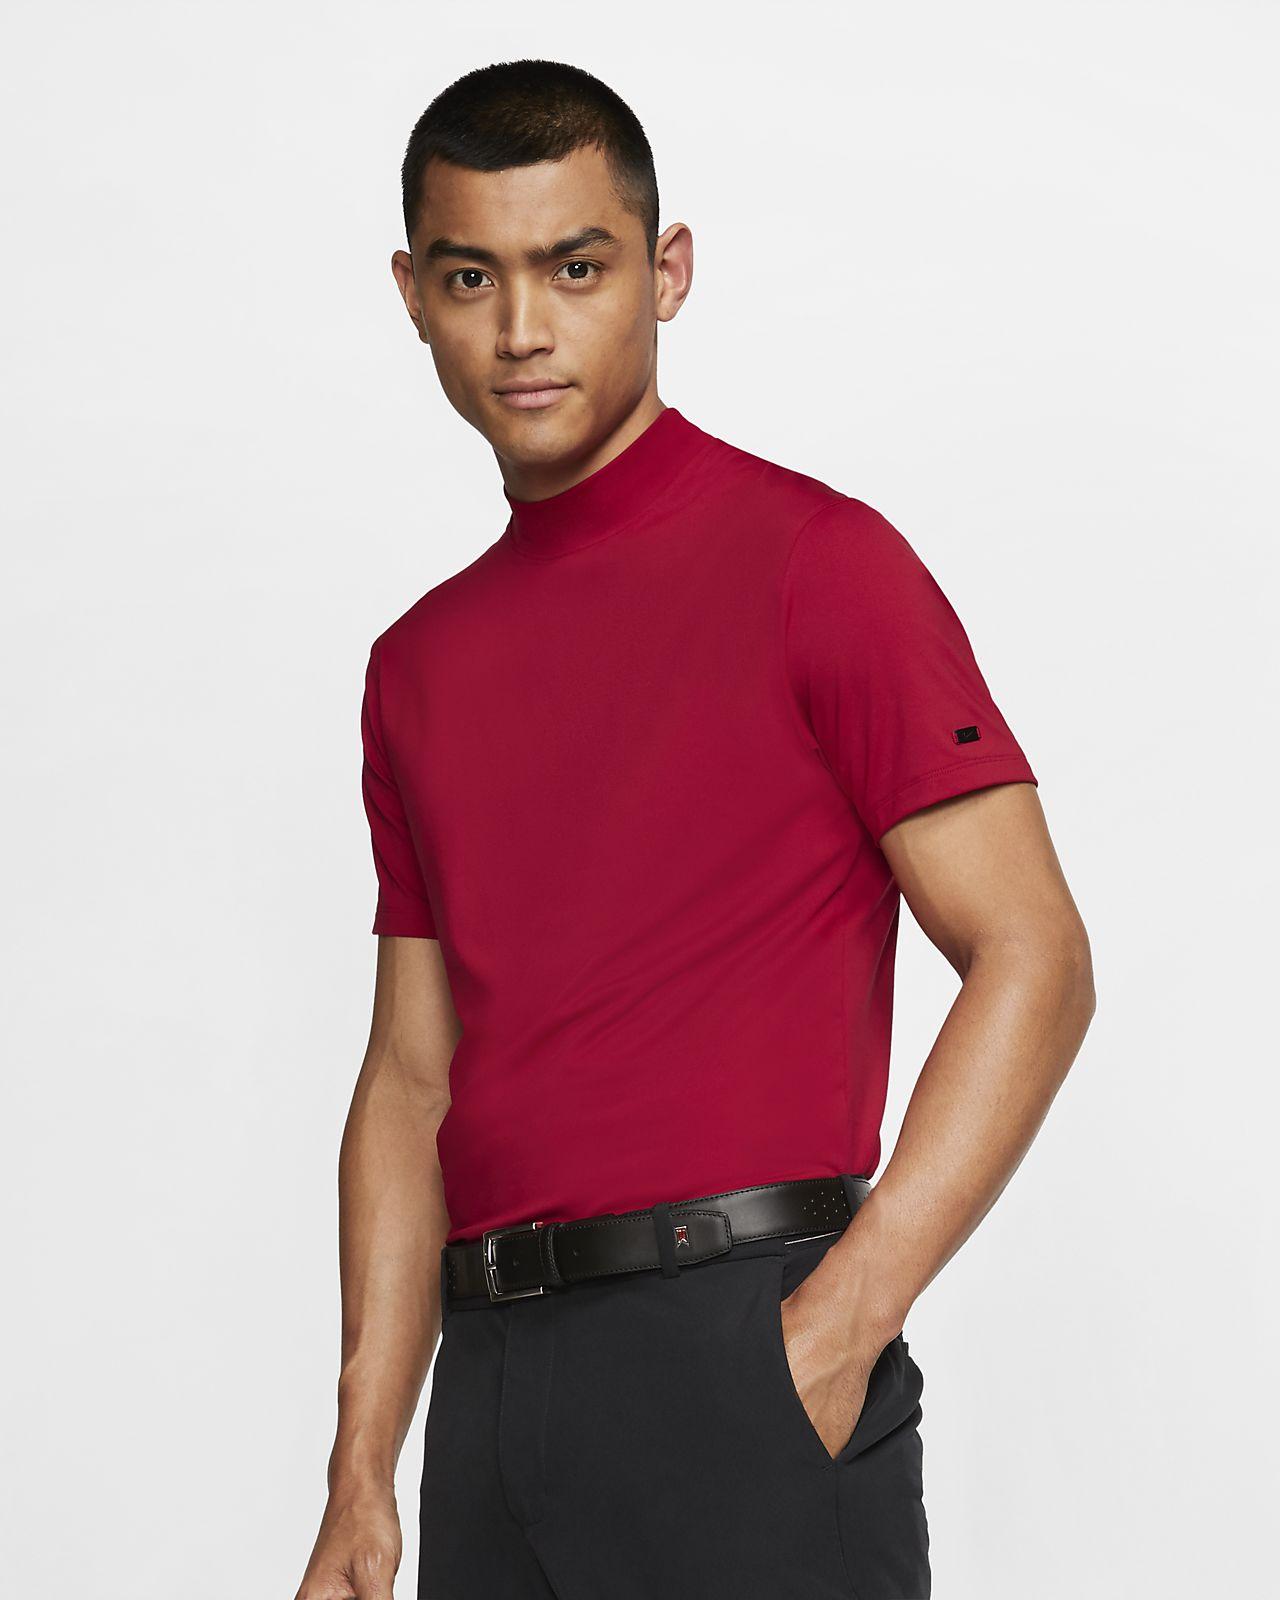 Nike Dri-FIT Tiger Woods Vapor álgalléros férfi golffelső